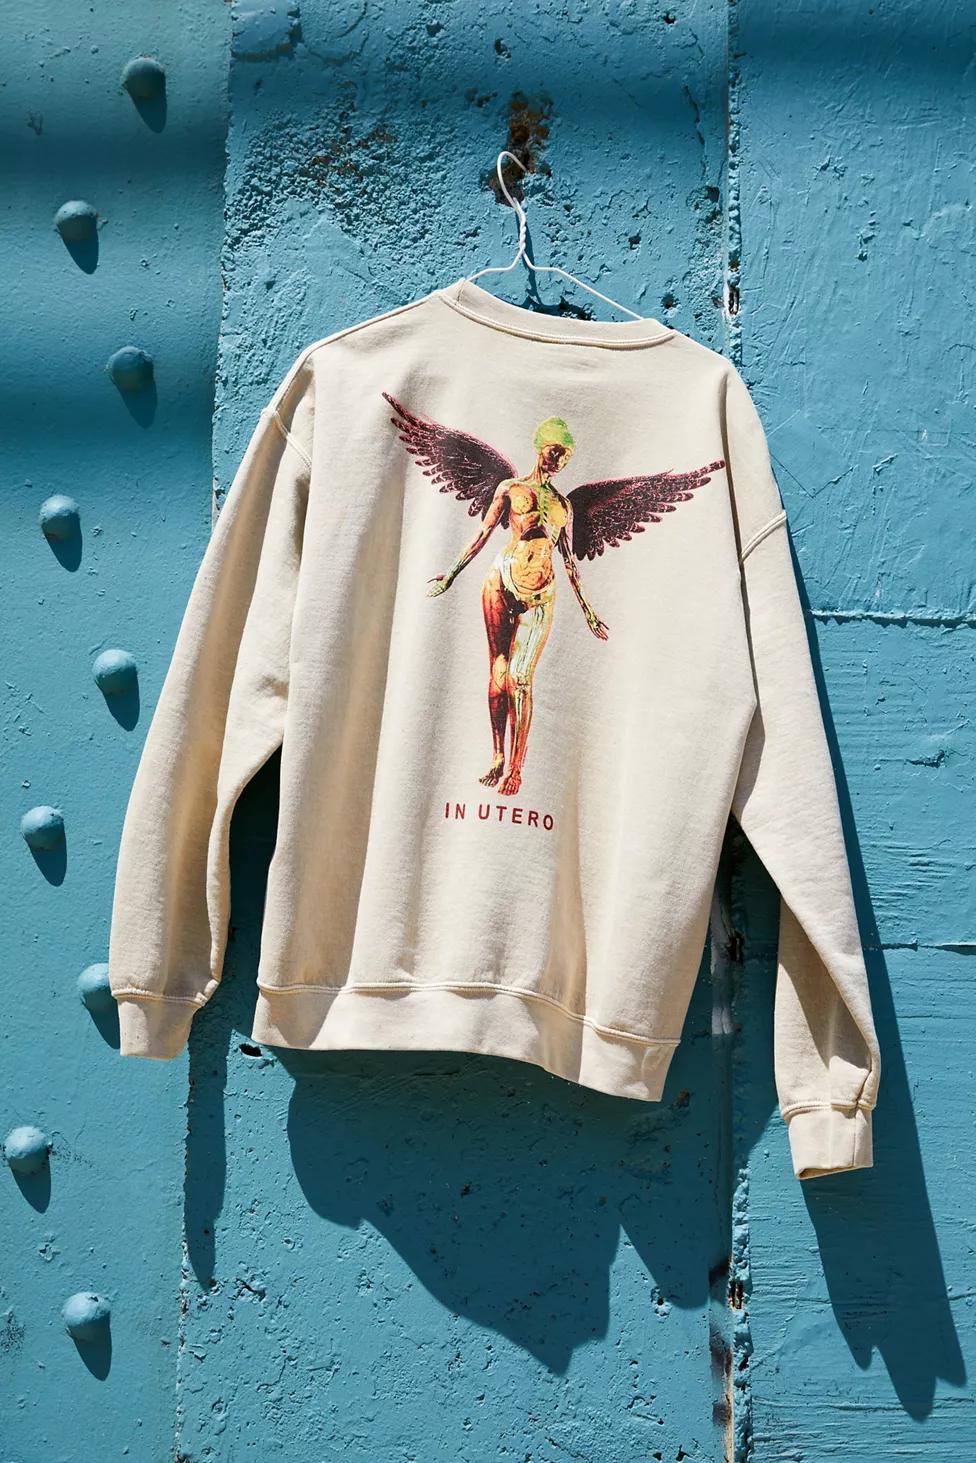 Nirvana In Utero Crew Neck Sweatshirt Crew Neck Sweatshirt Sweatshirts Vintage Clothing Men [ 1463 x 976 Pixel ]